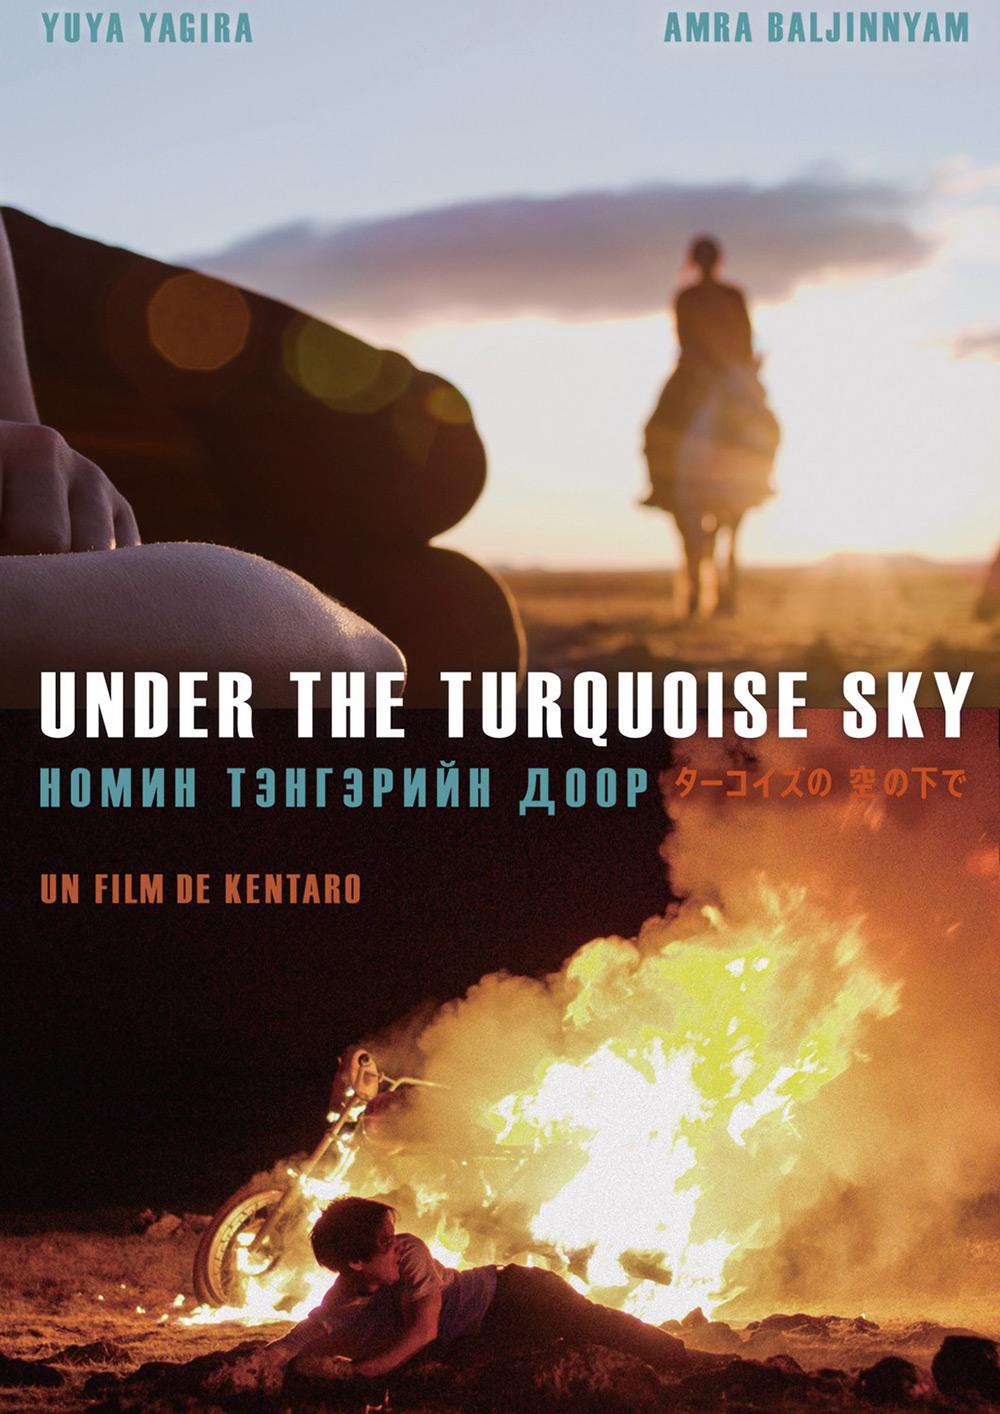 Under the Turquoise Sky film - Kentaro